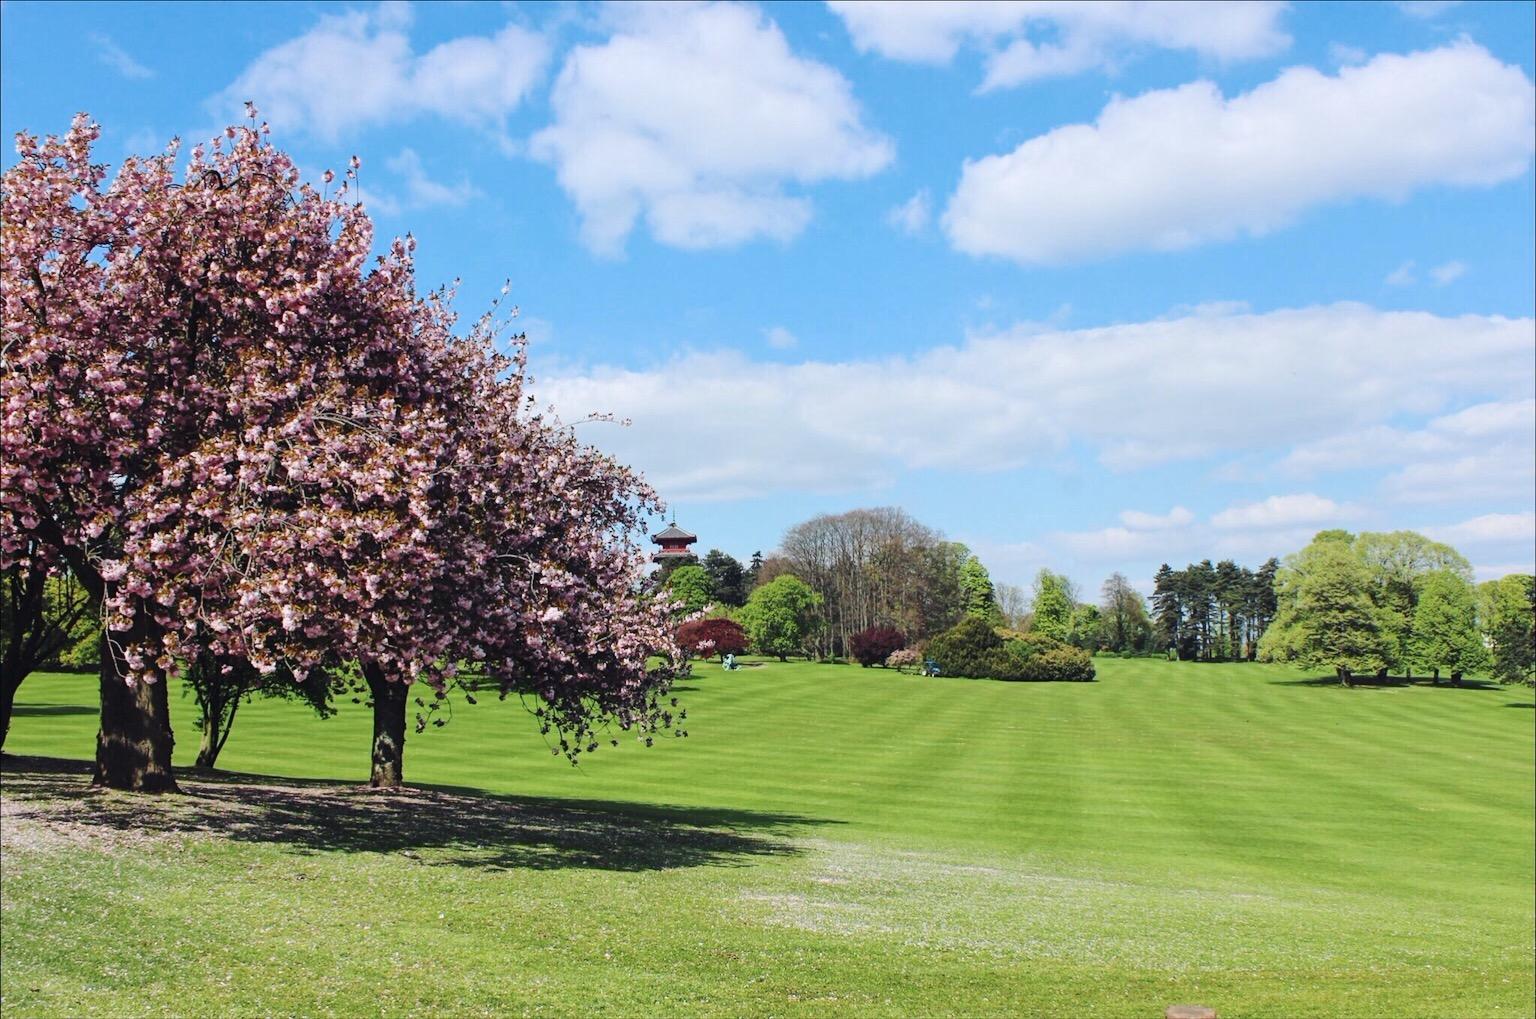 Royal gardens brussels